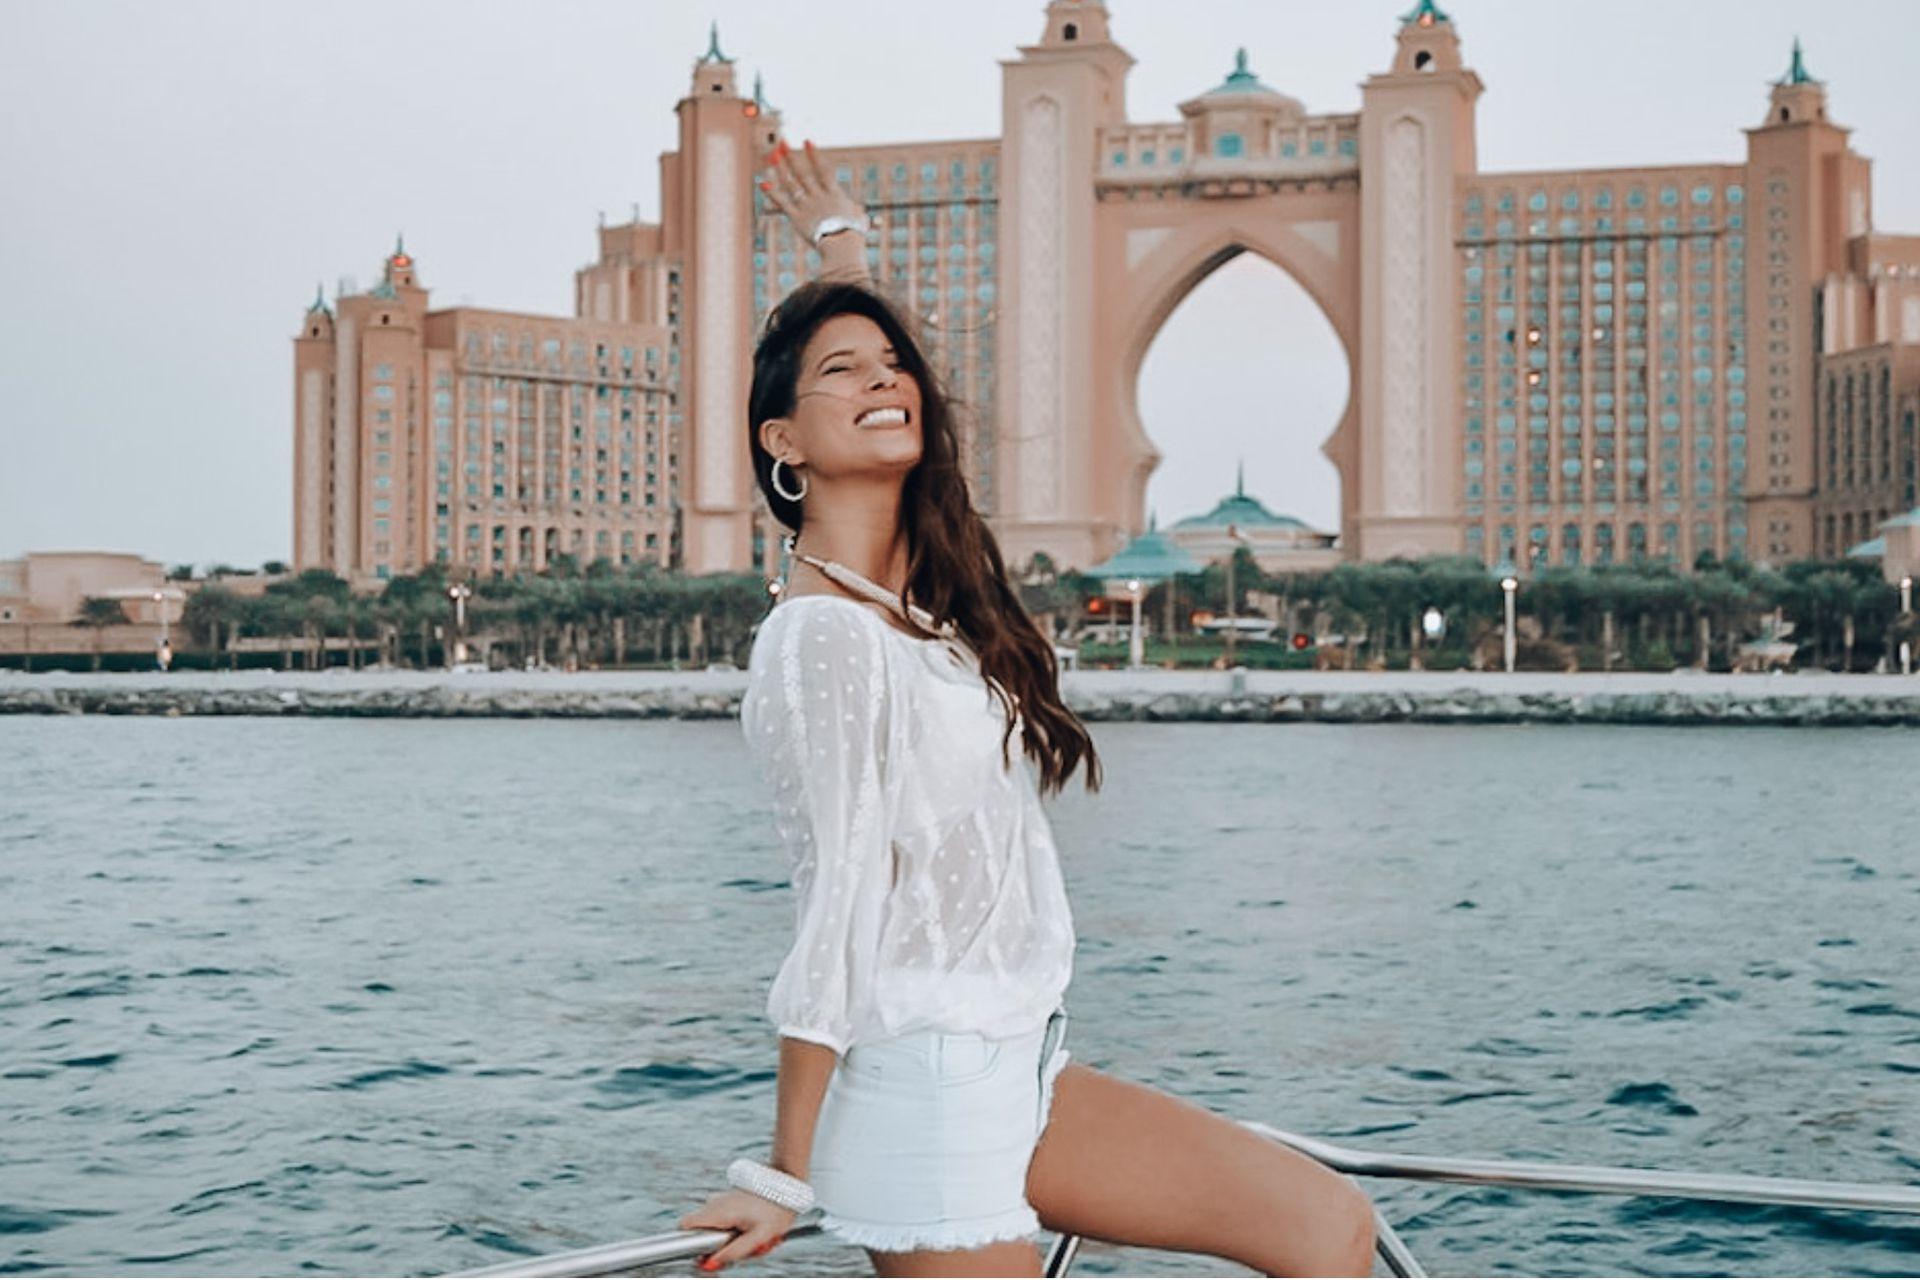 Débora frente al Atlantis Hotel en Dubái.